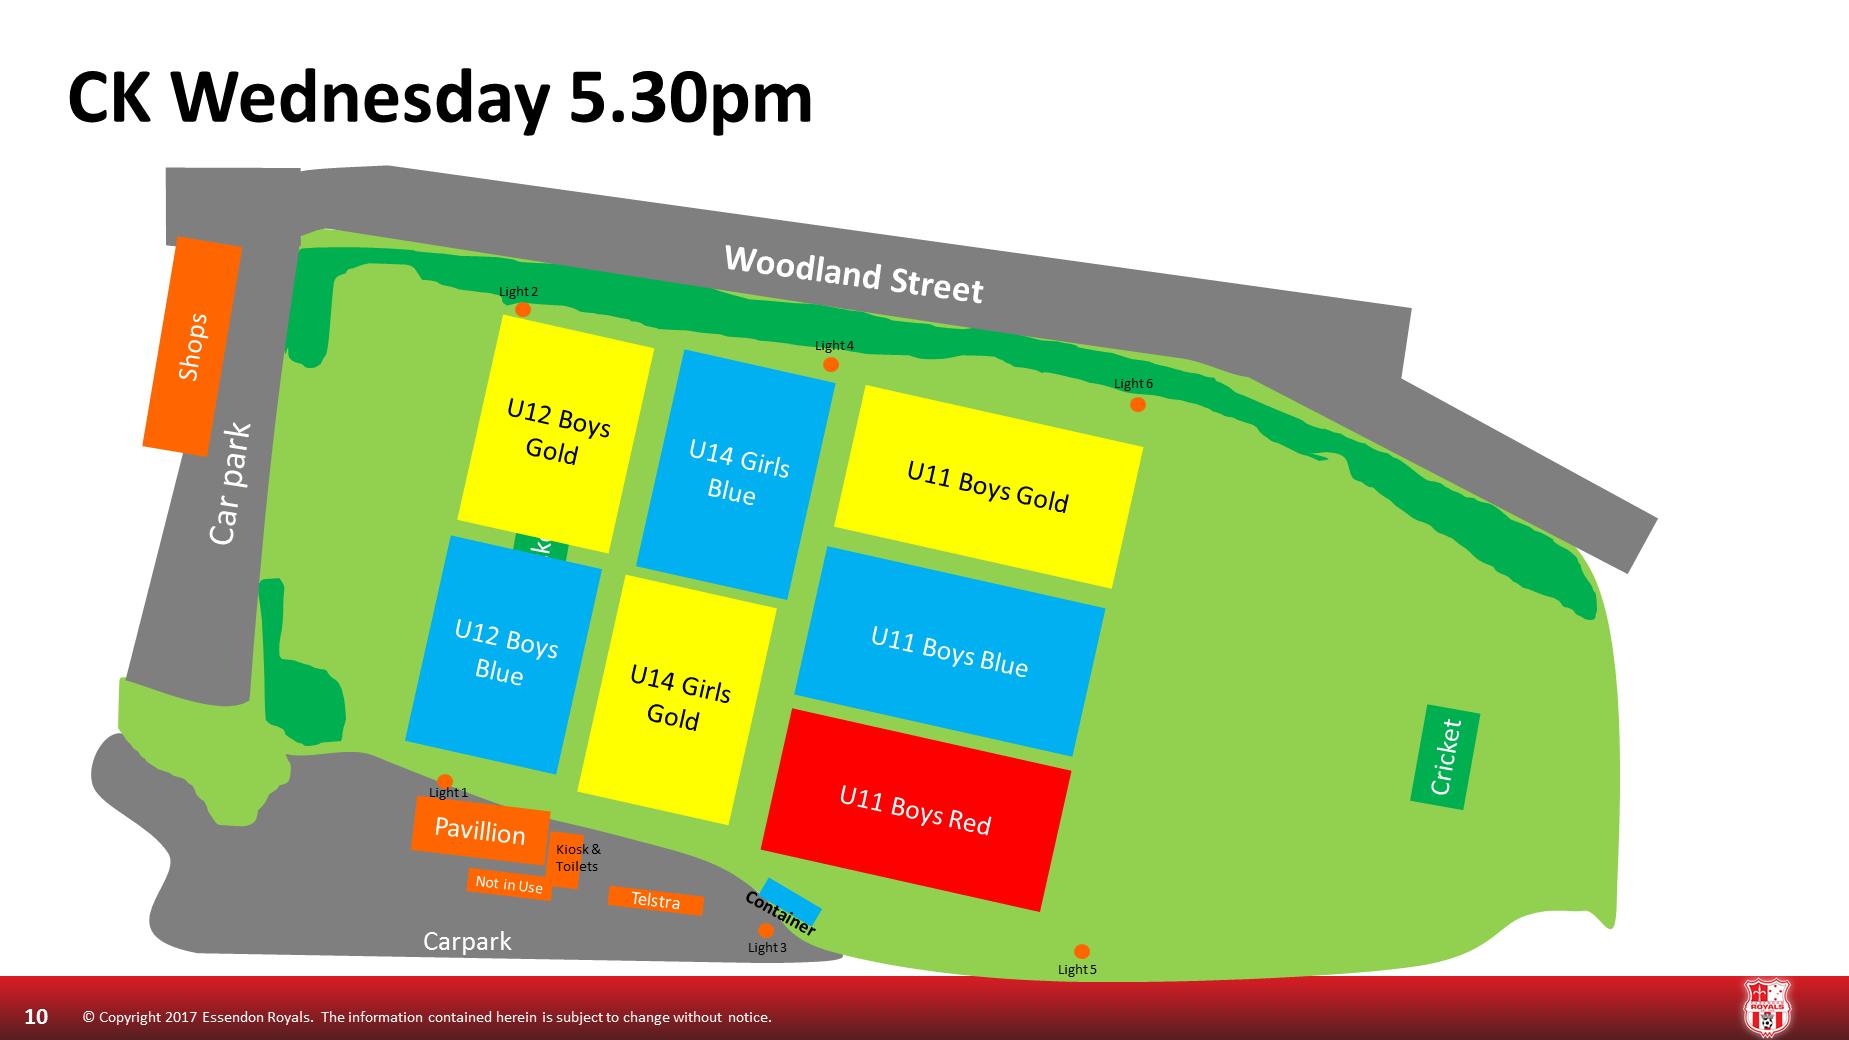 Wednesday 5.30 Cross Keys